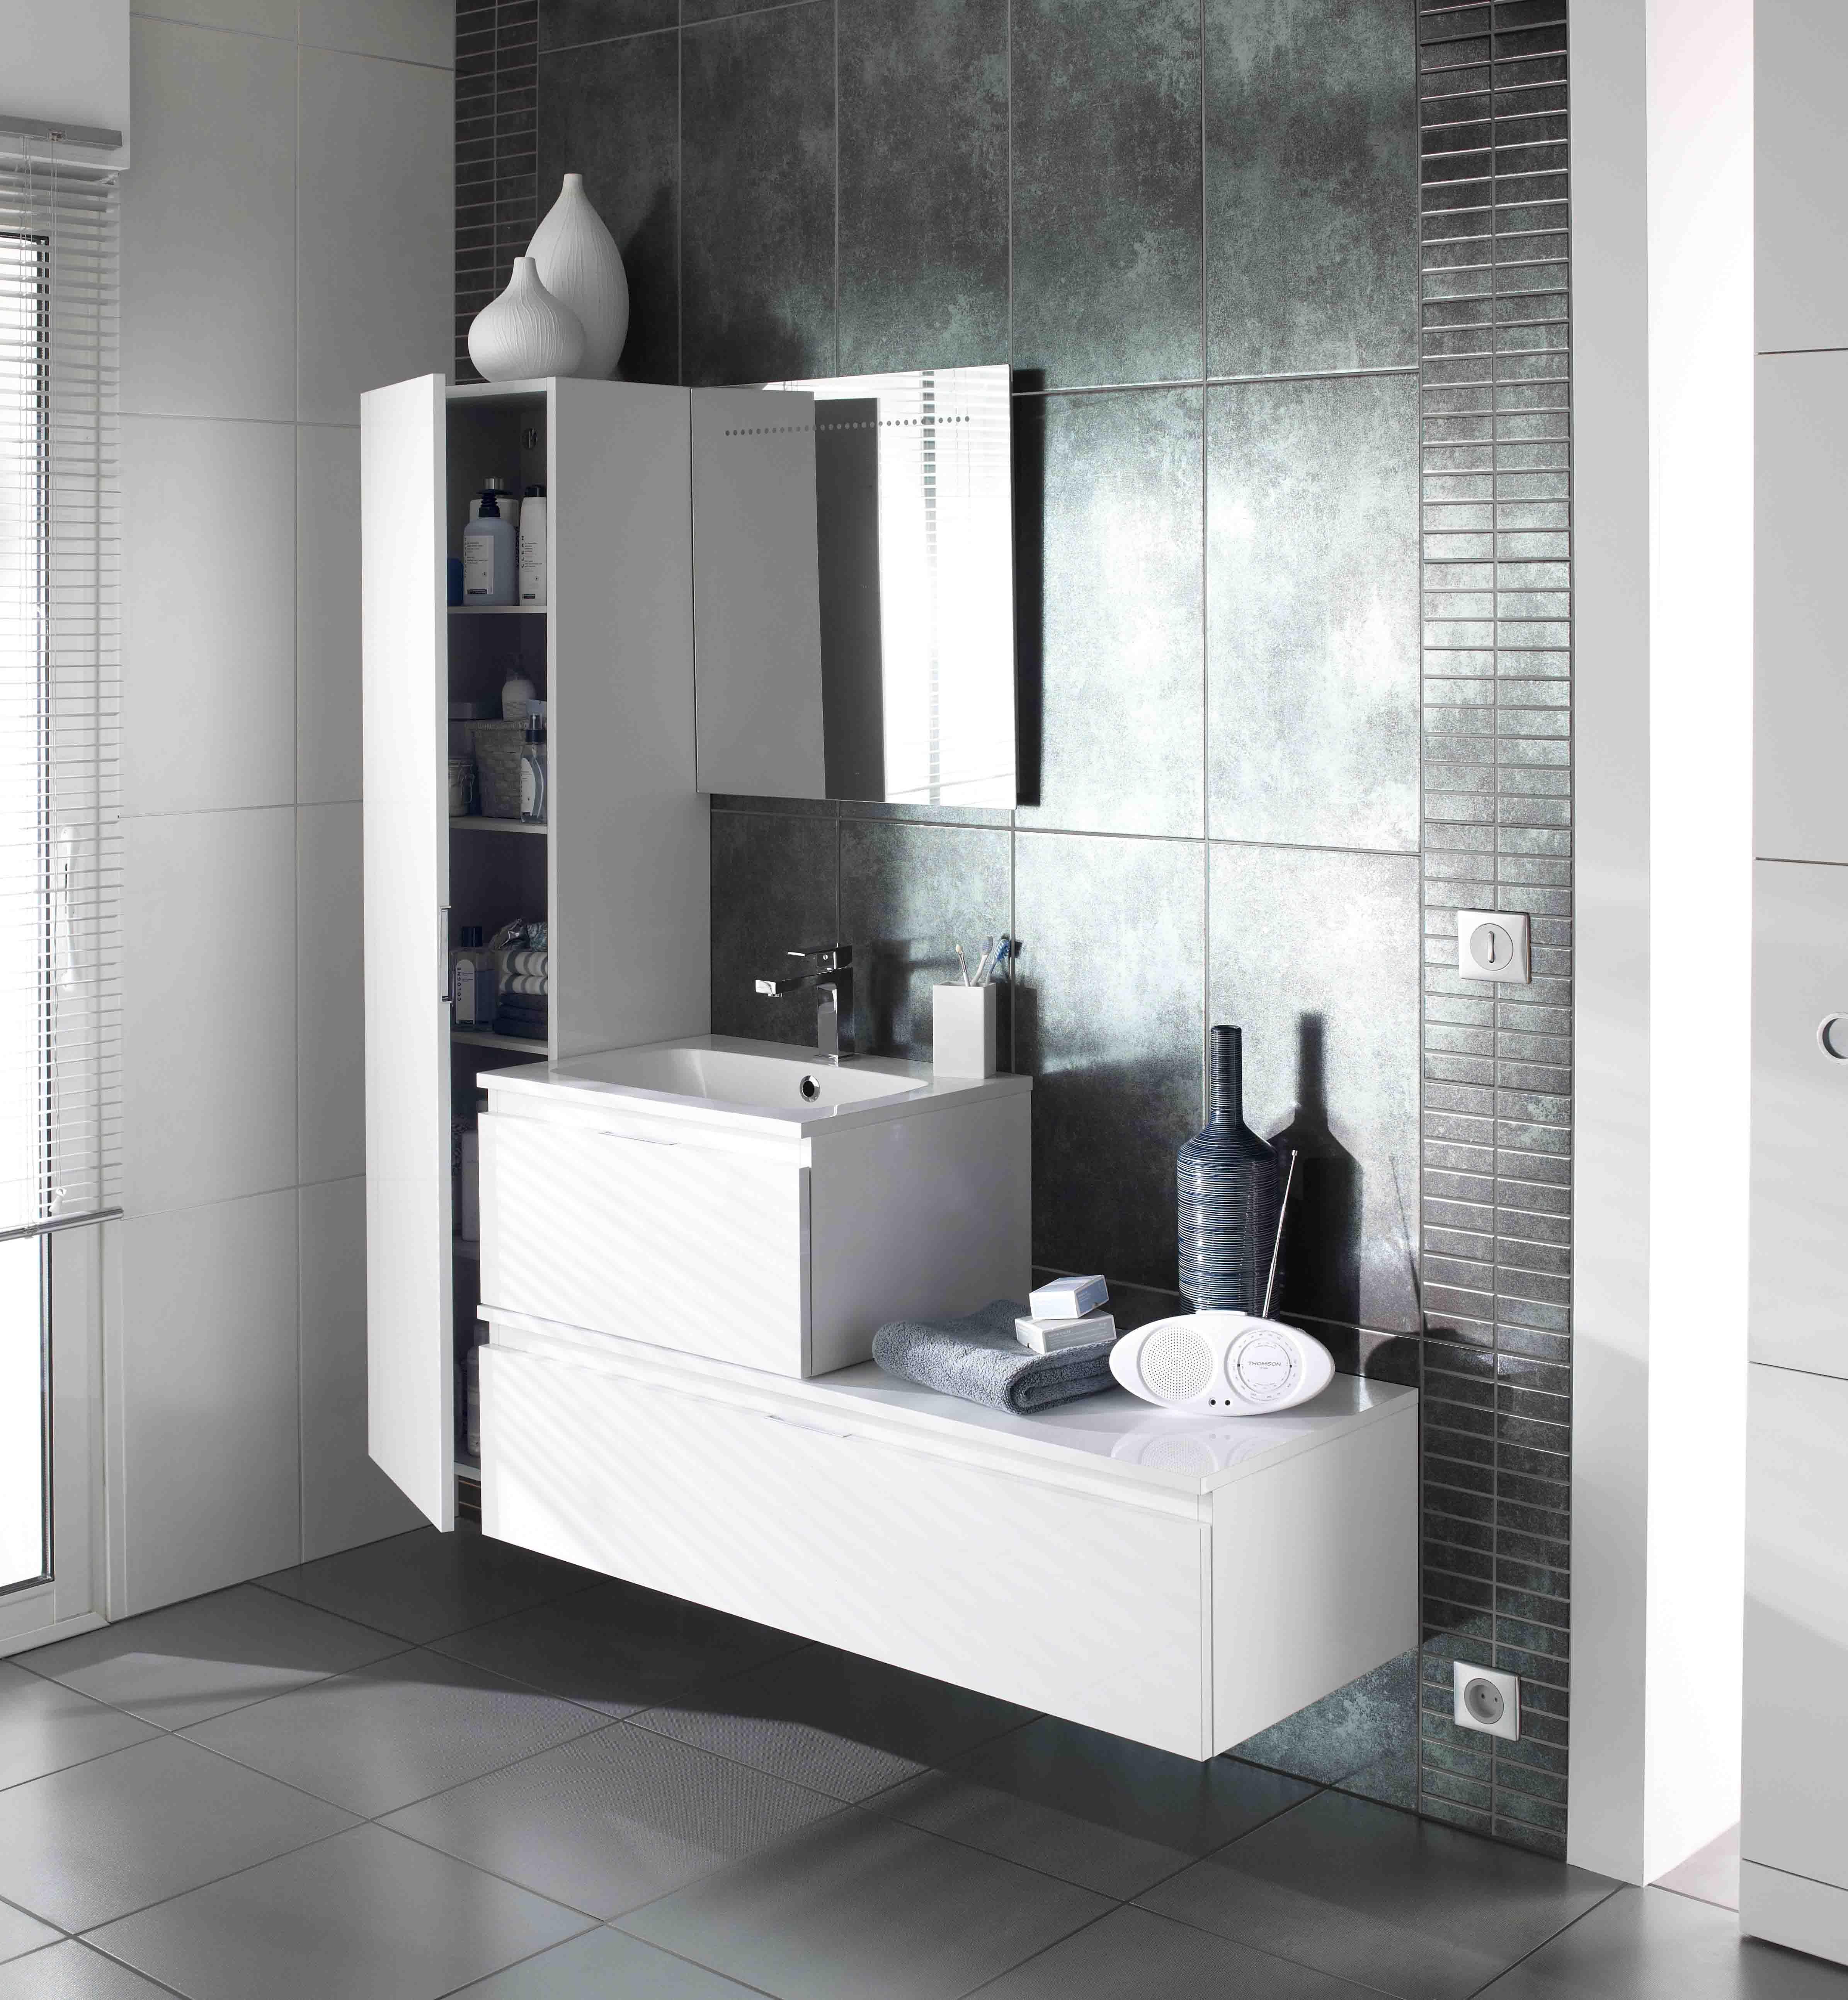 Lapeyre salle de bain meuble evasion salle de bains inspiration design - Lapeyre salles de bain ...